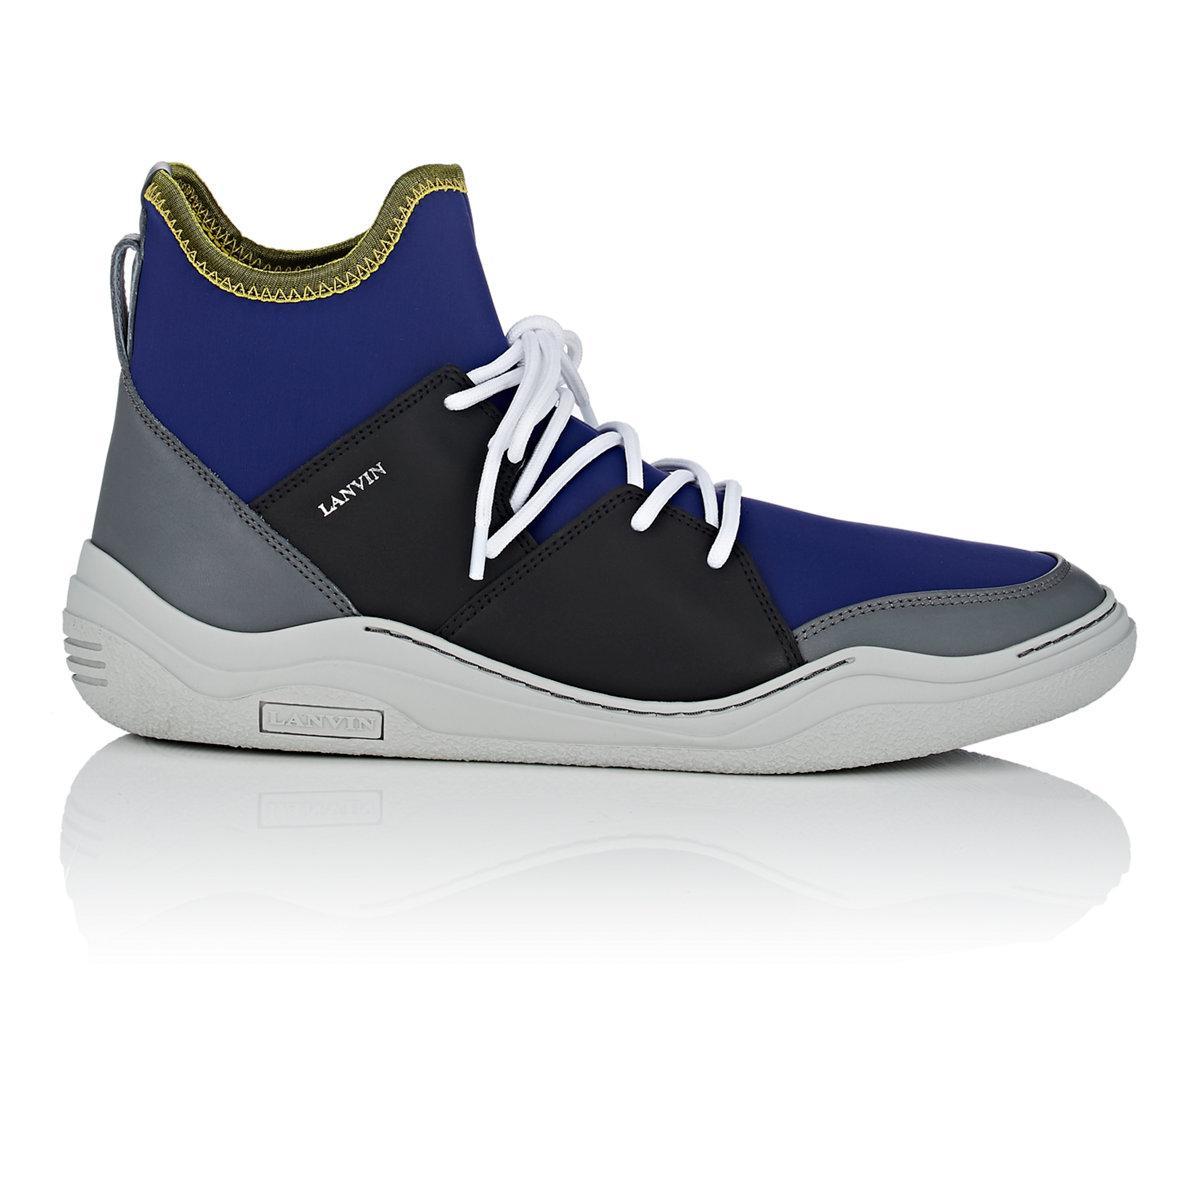 Mens Neoprene & Leather Sneakers Lanvin ktrLdwh